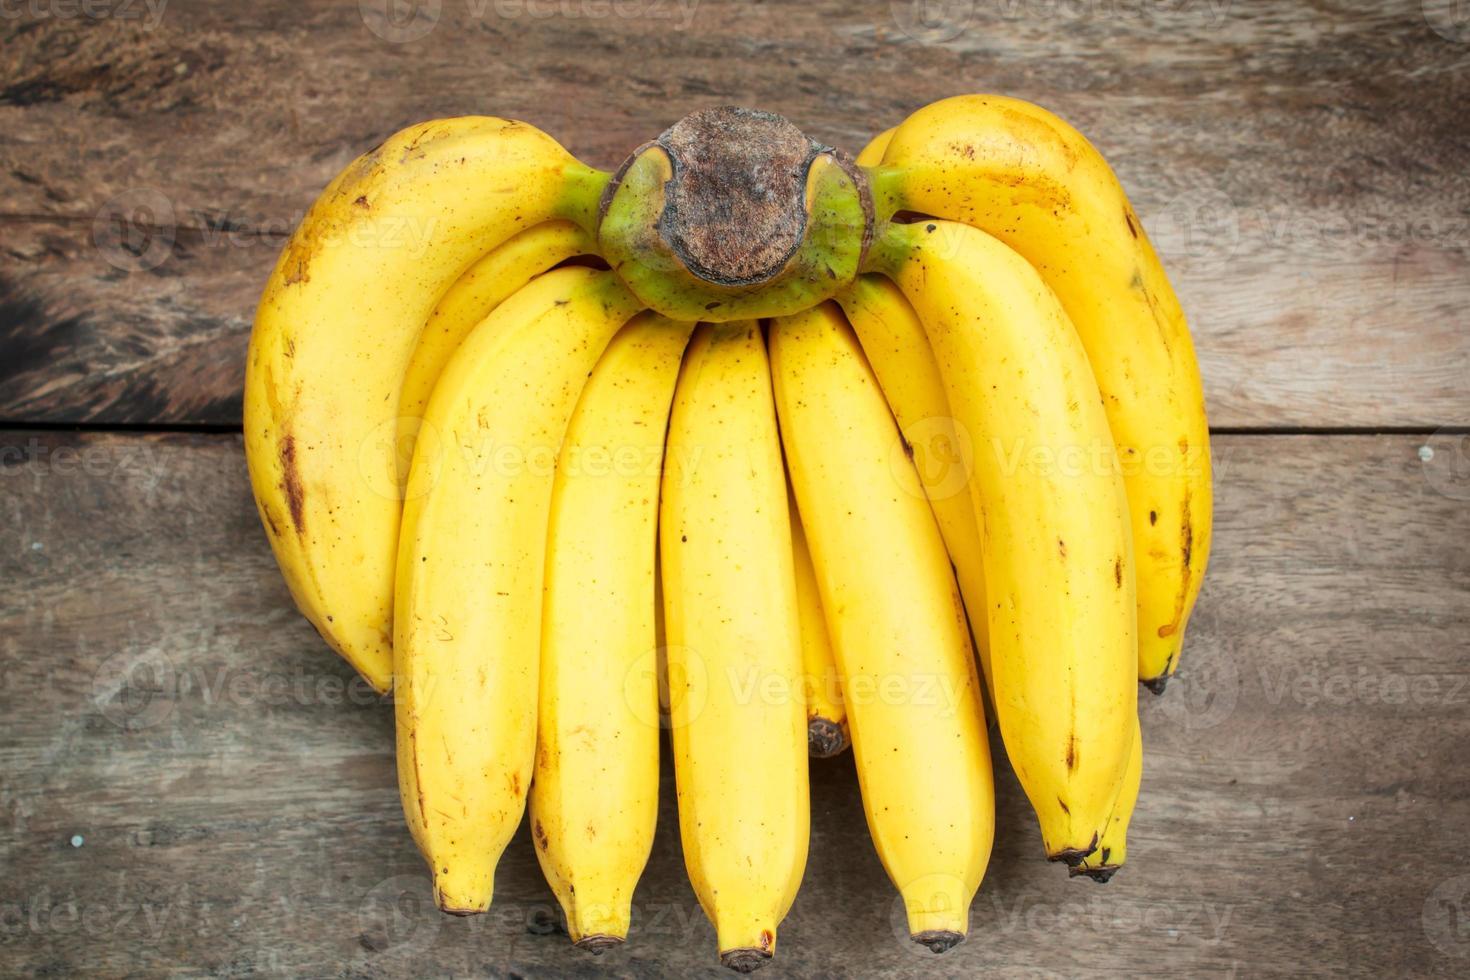 Bunch of bananas. photo